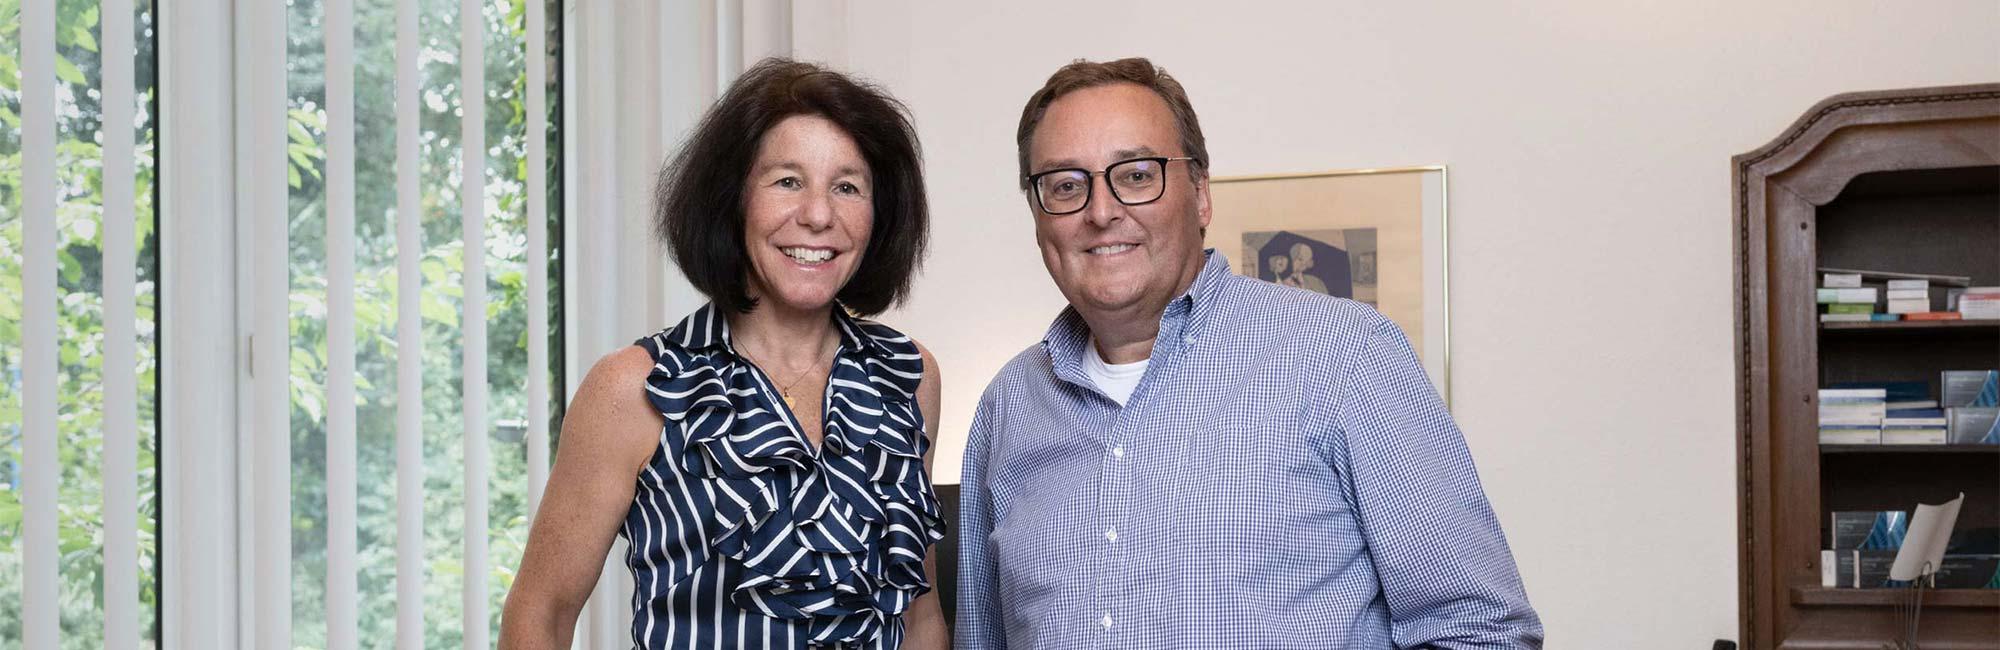 Urologe Langenfeld – Private Gemeinschaftspraxis für Urologie und Andrologie in Solingen